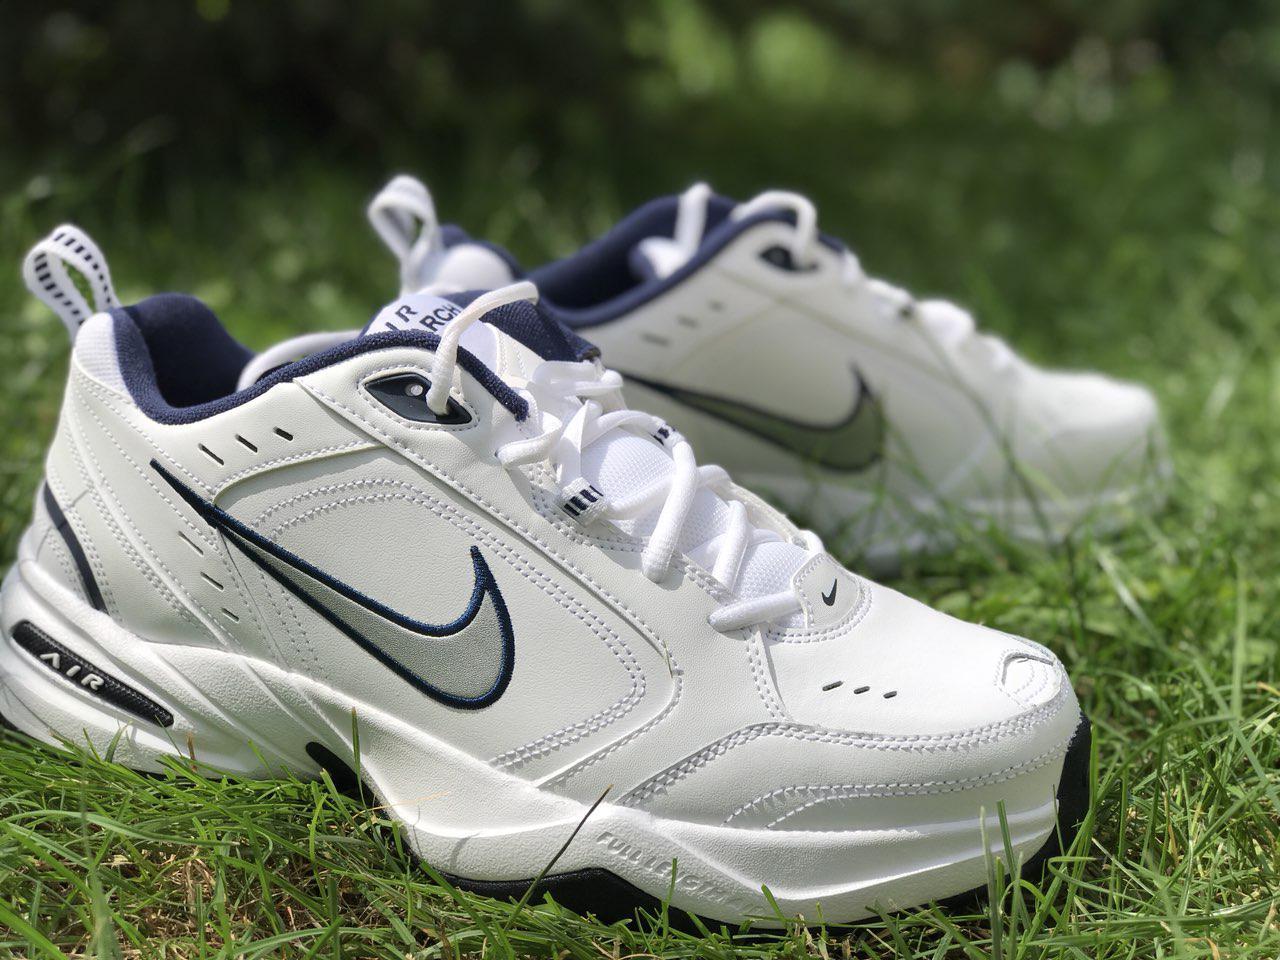 6455e94764ba Оригинальные мужские кроссовки Nike Air Monarch IV White - Sport-Boots -  Только оригинальные товары